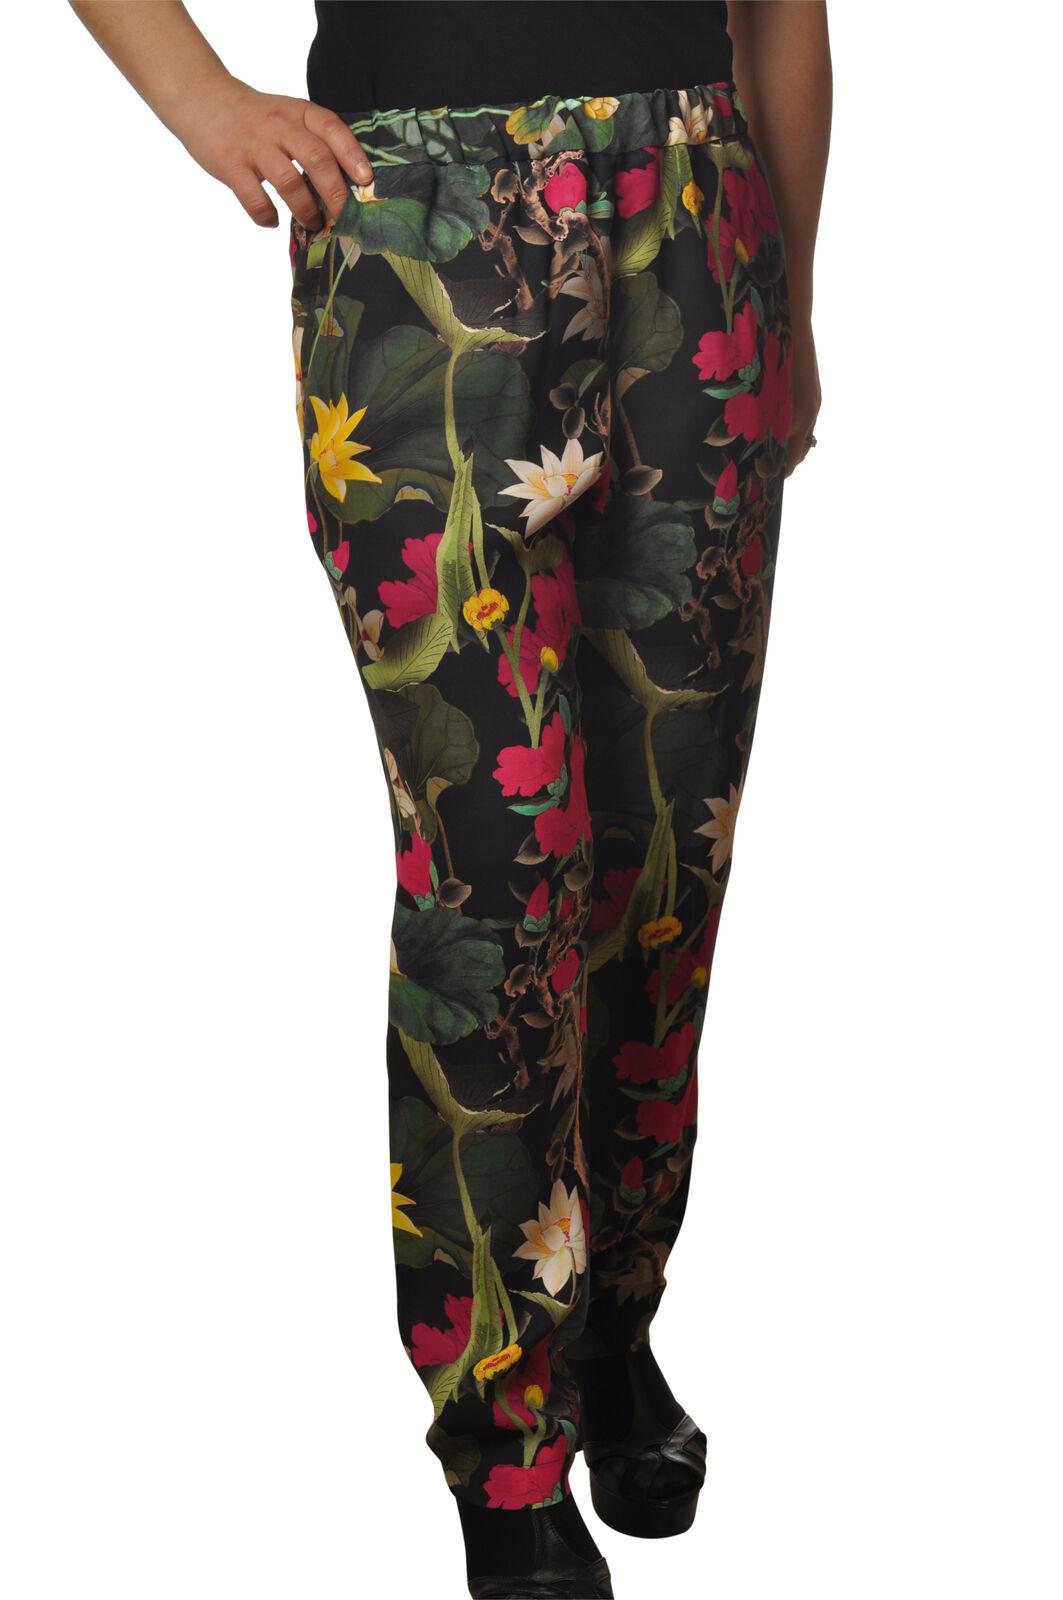 Meme - Pants-Pants  - Woman - Fantasy - 6252408H190933  precio razonable